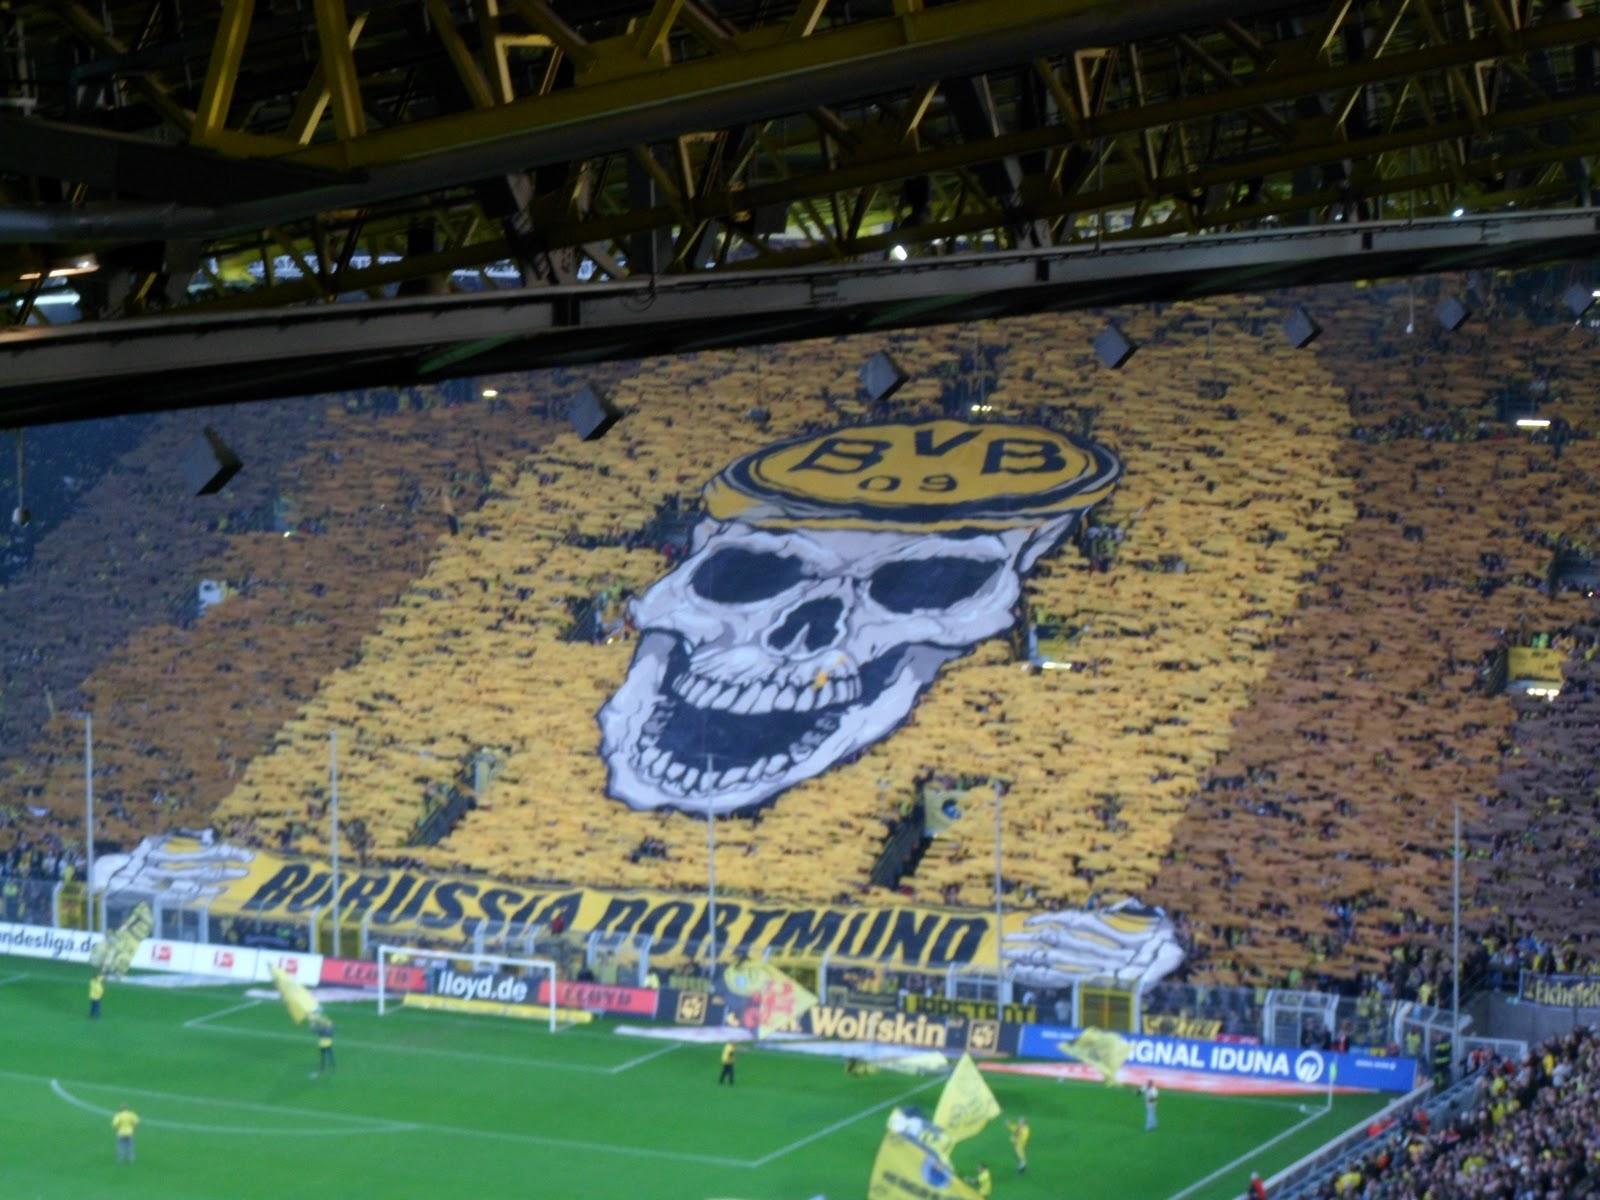 Signal Iduna Park Wallpaper Hd Borussia Dortmund Vs Vfl Wolfsburg November 2011 Bar